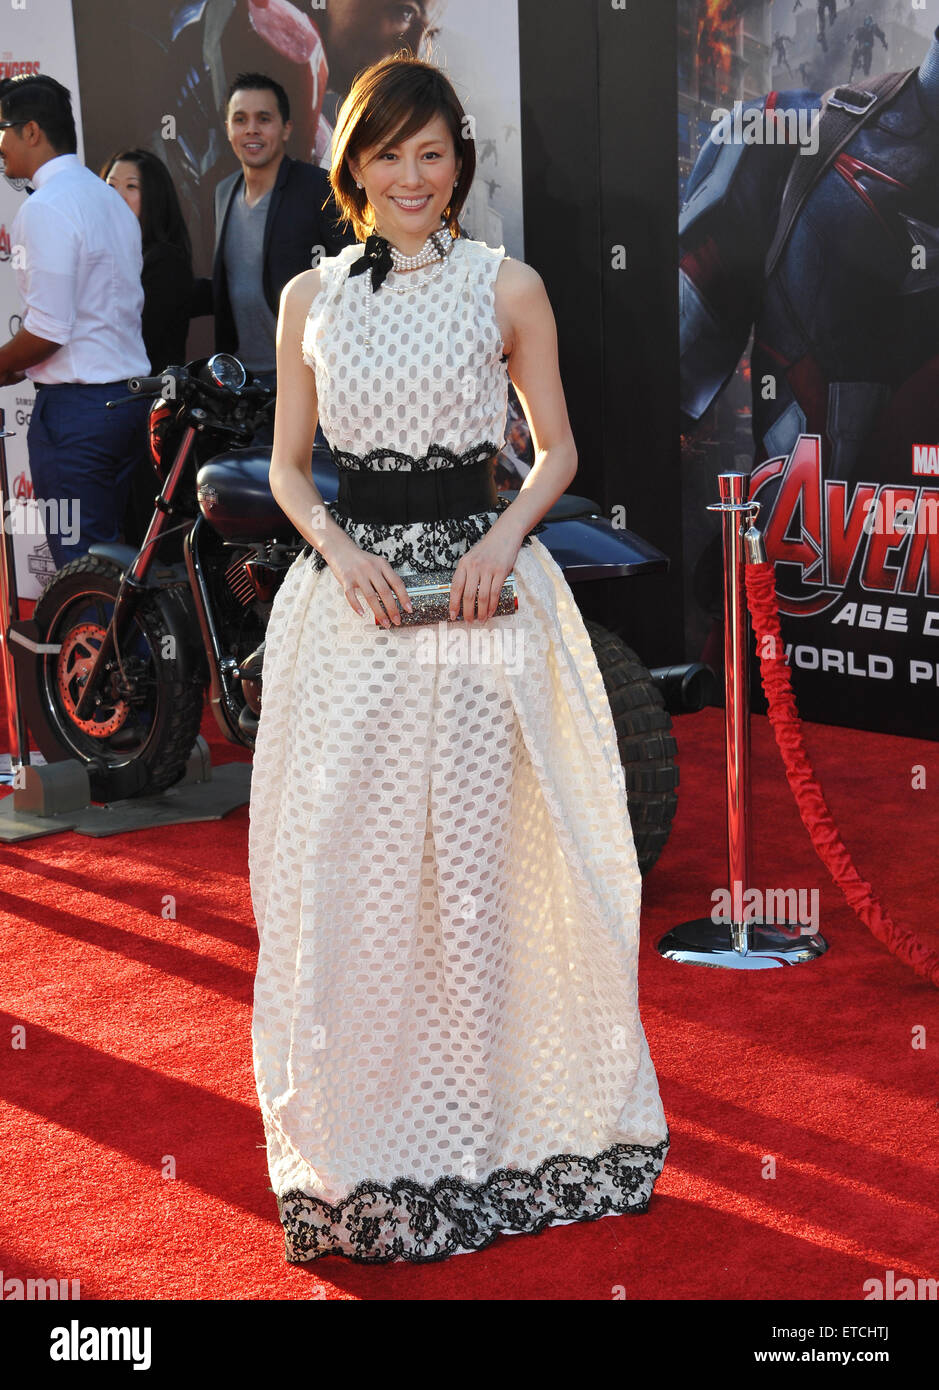 LOS ANGELES, CA - APRIL 13, 2015: Ryoko Yonekura at the world premiere of 'Avengers: Age of Ultron' at the - Stock Image